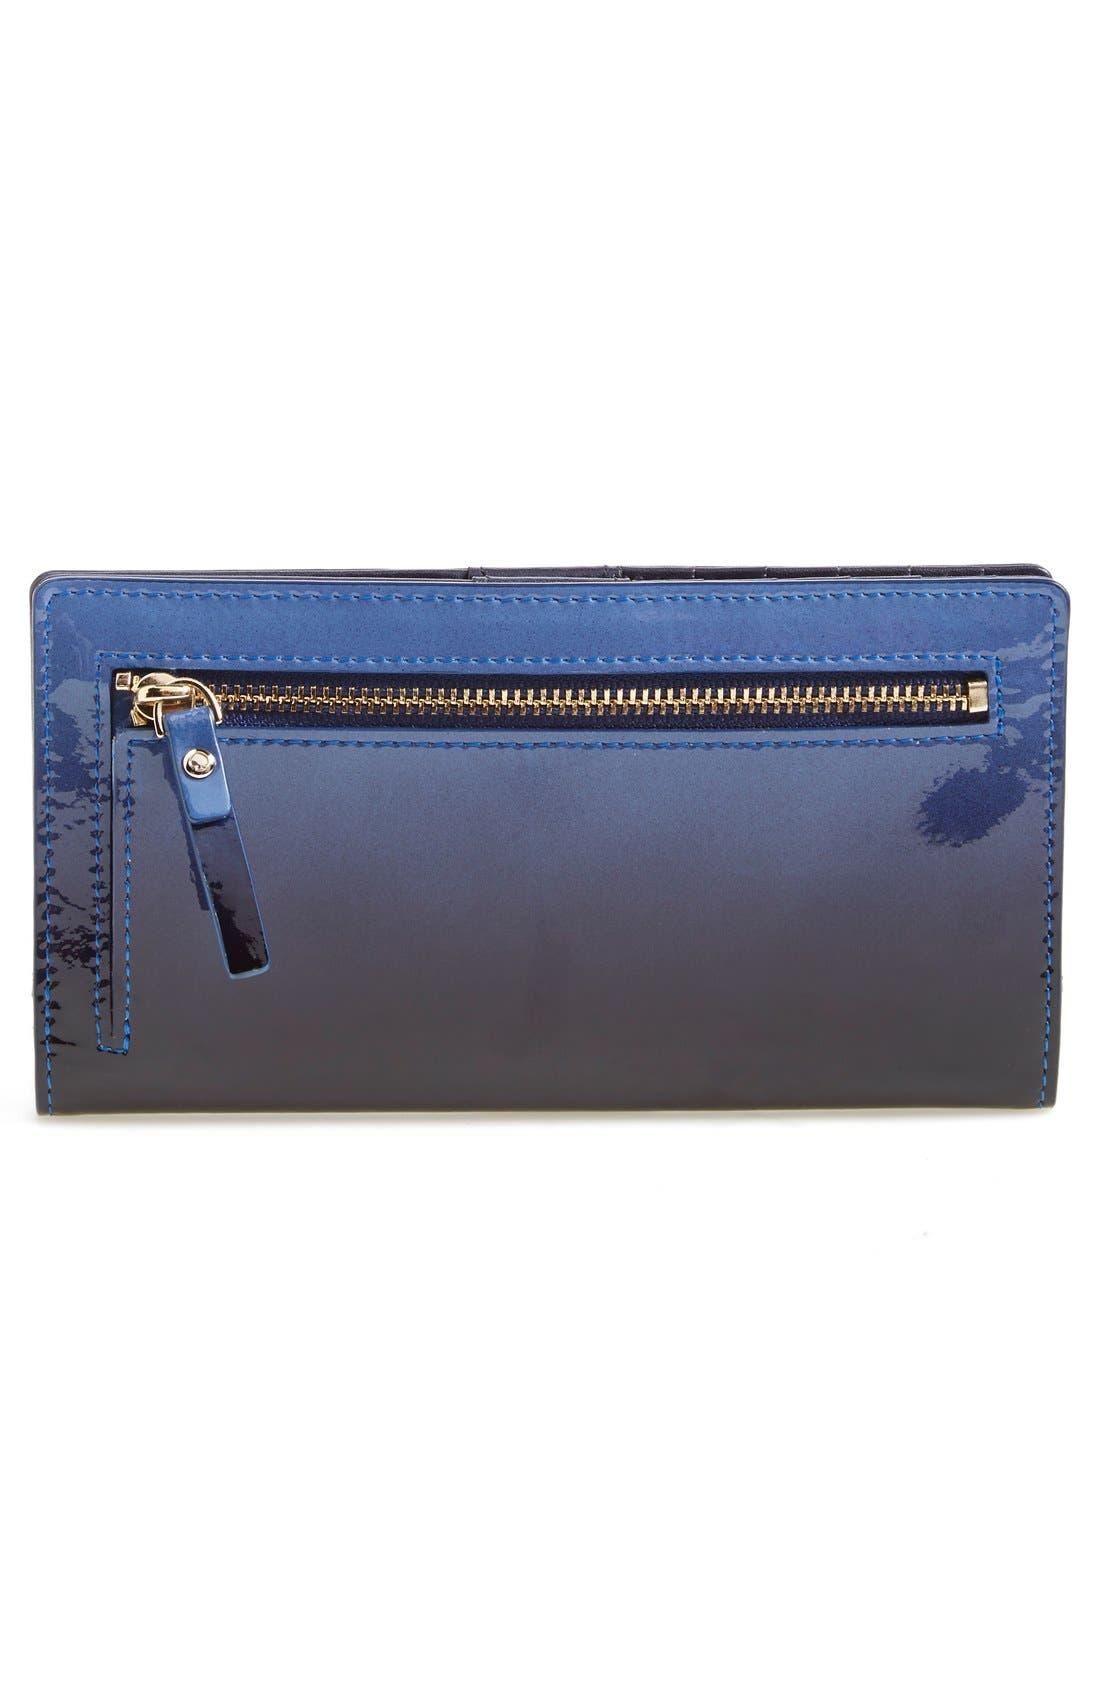 Alternate Image 3  - kate spade new york 'cedar street - ombré patent stacy' leather clutch wallet